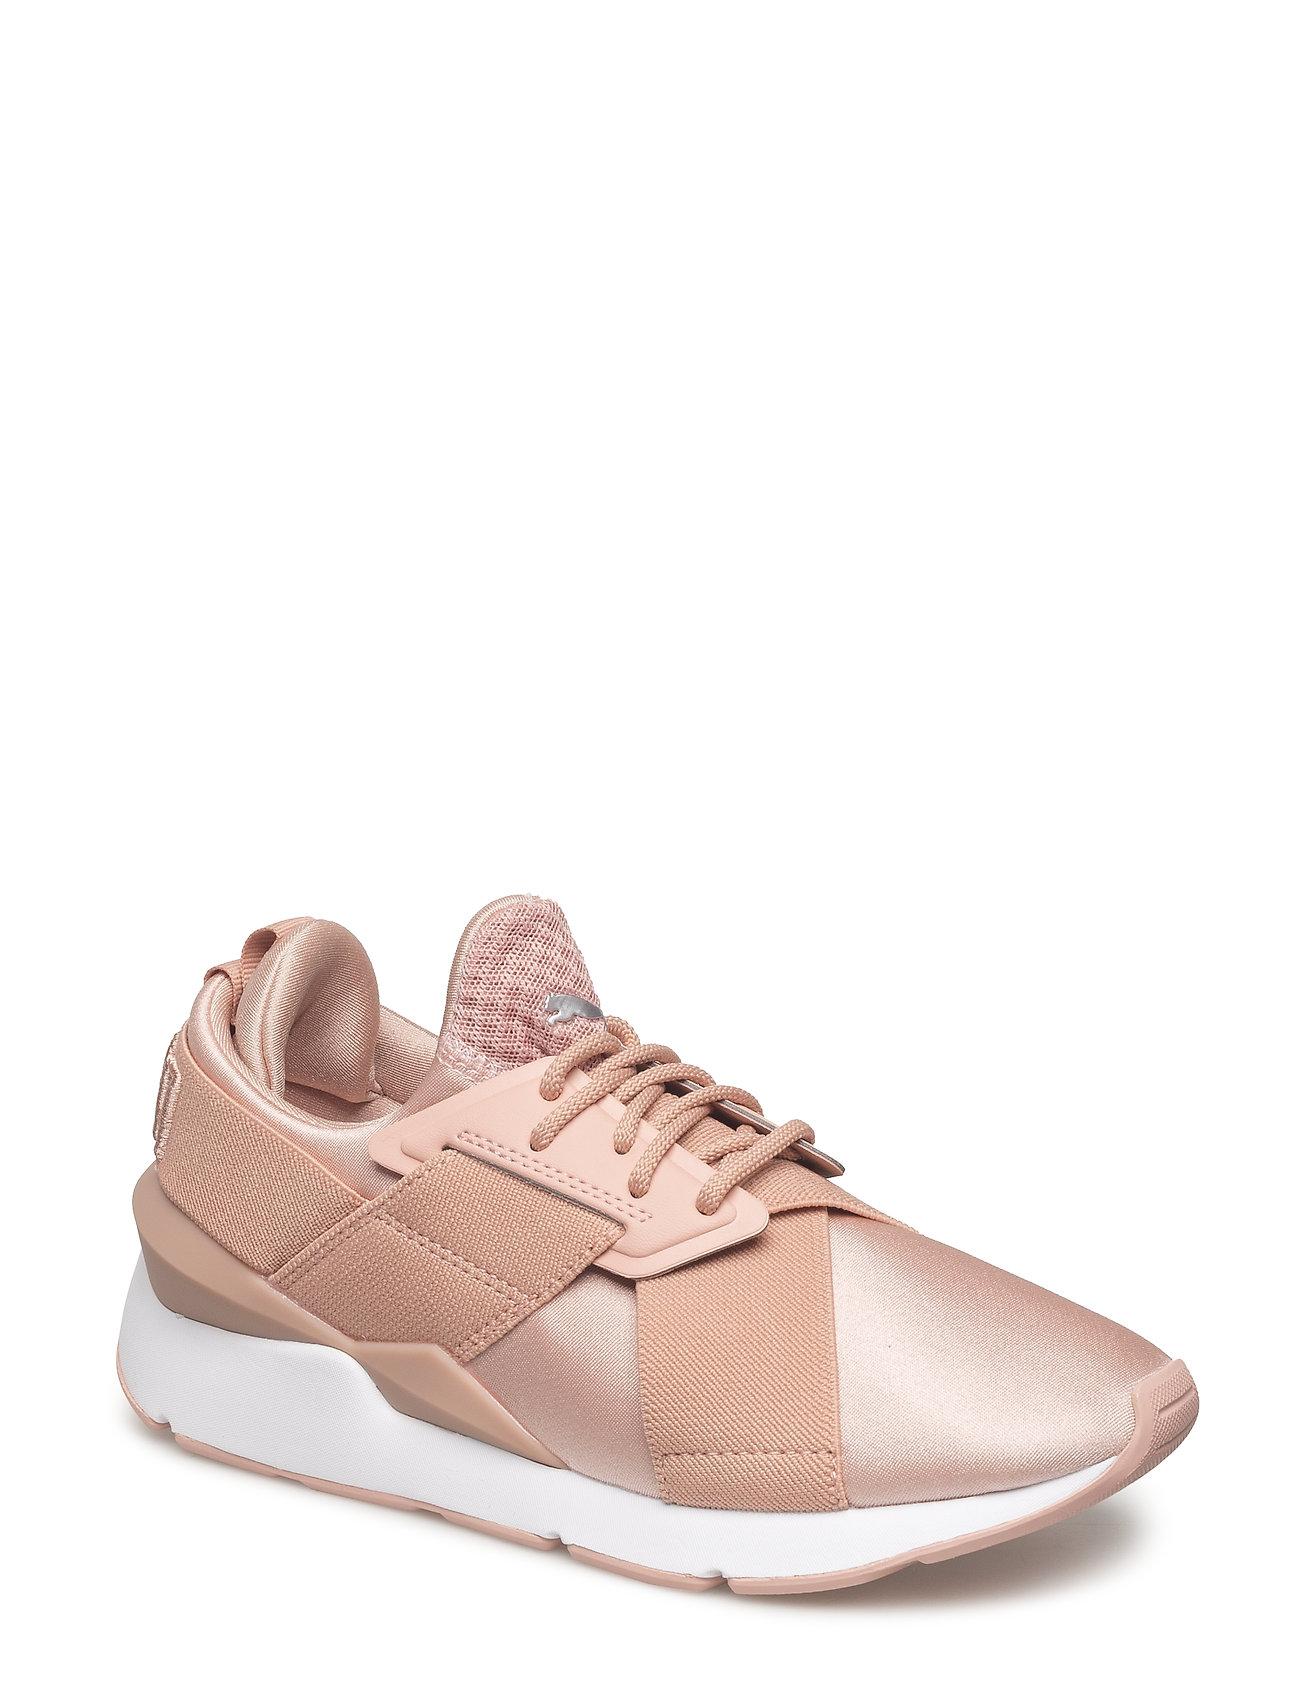 Køb Puma Damer Muse Satin II Sneakers Vinrød